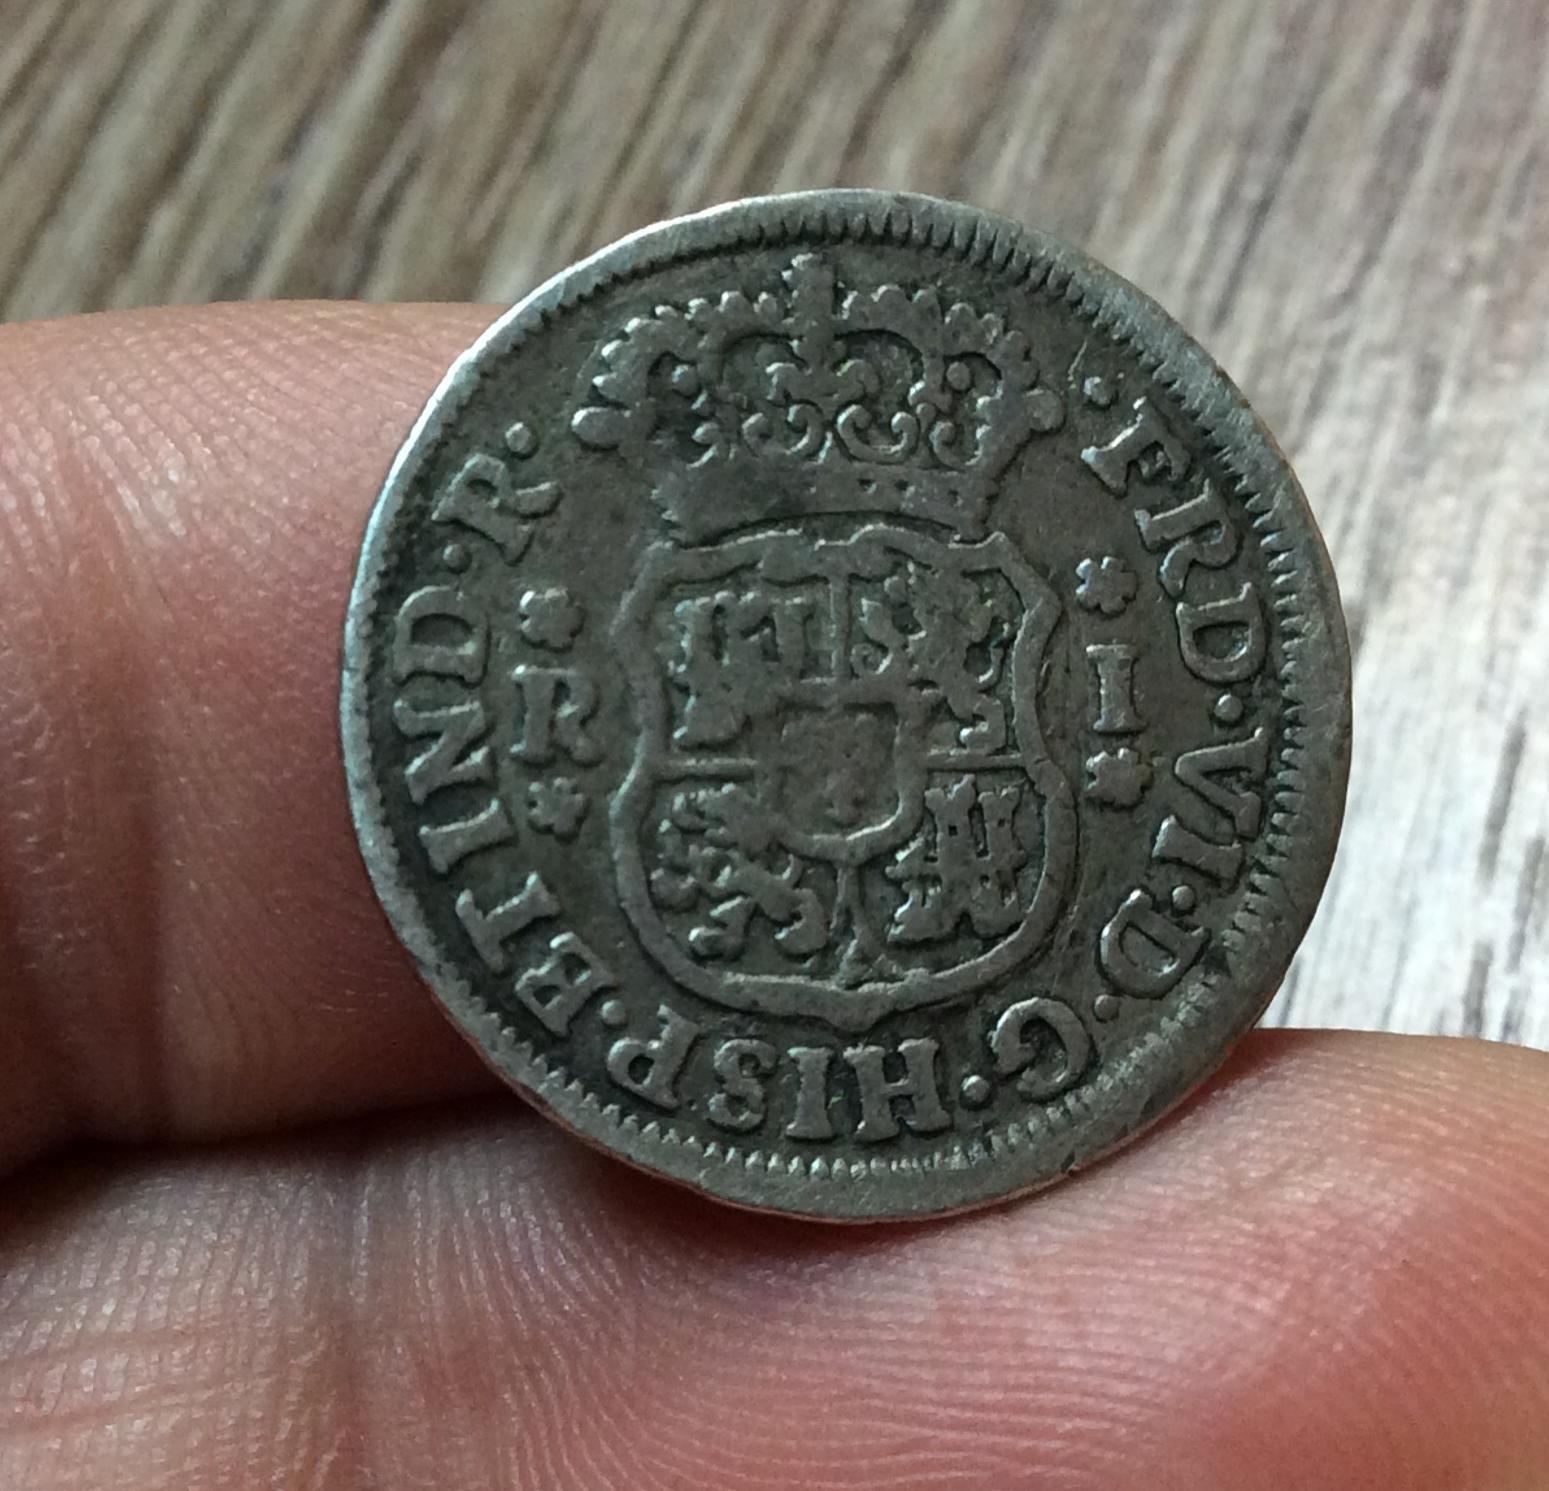 COLUMNARIO DE 1 REAL 1755 - FERNANDO VI - MEXICO